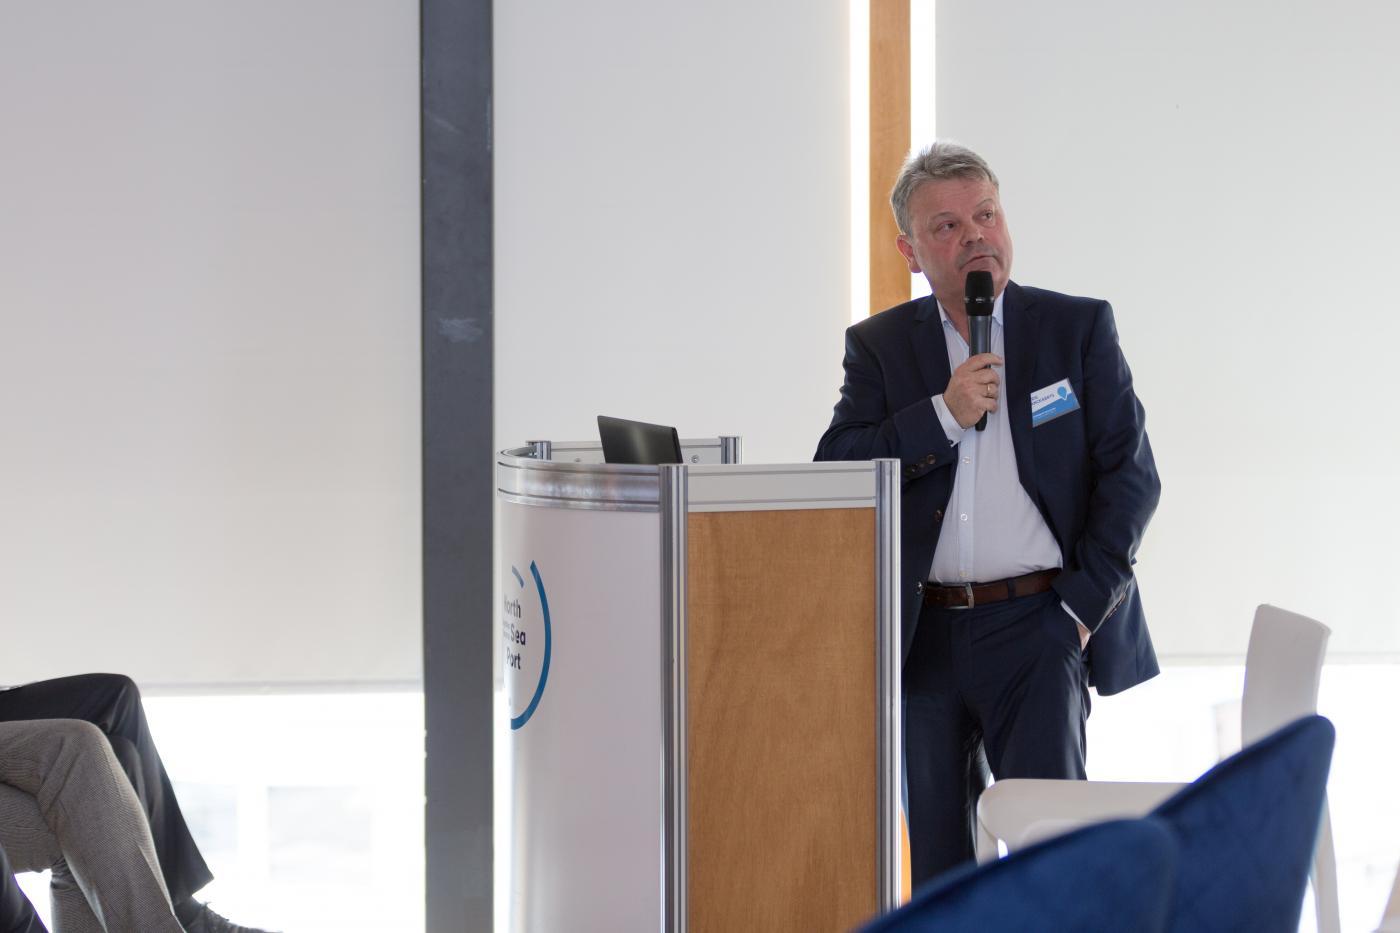 Chris Danckaerts, gedelegeerd bestuurder van De Vlaamse Waterweg nv